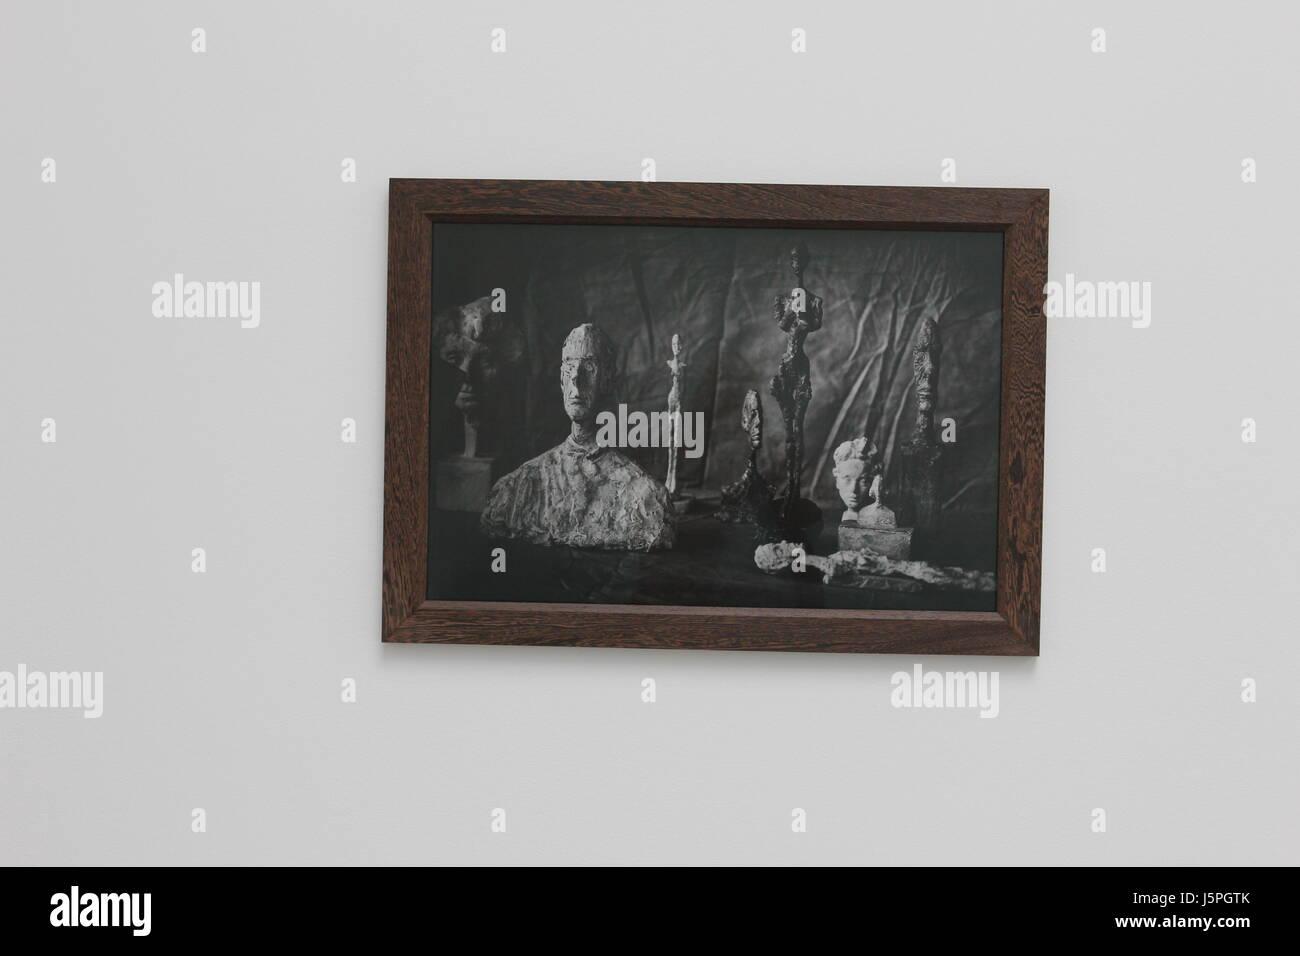 Peter Lindbergh Stockfotos & Peter Lindbergh Bilder - Alamy